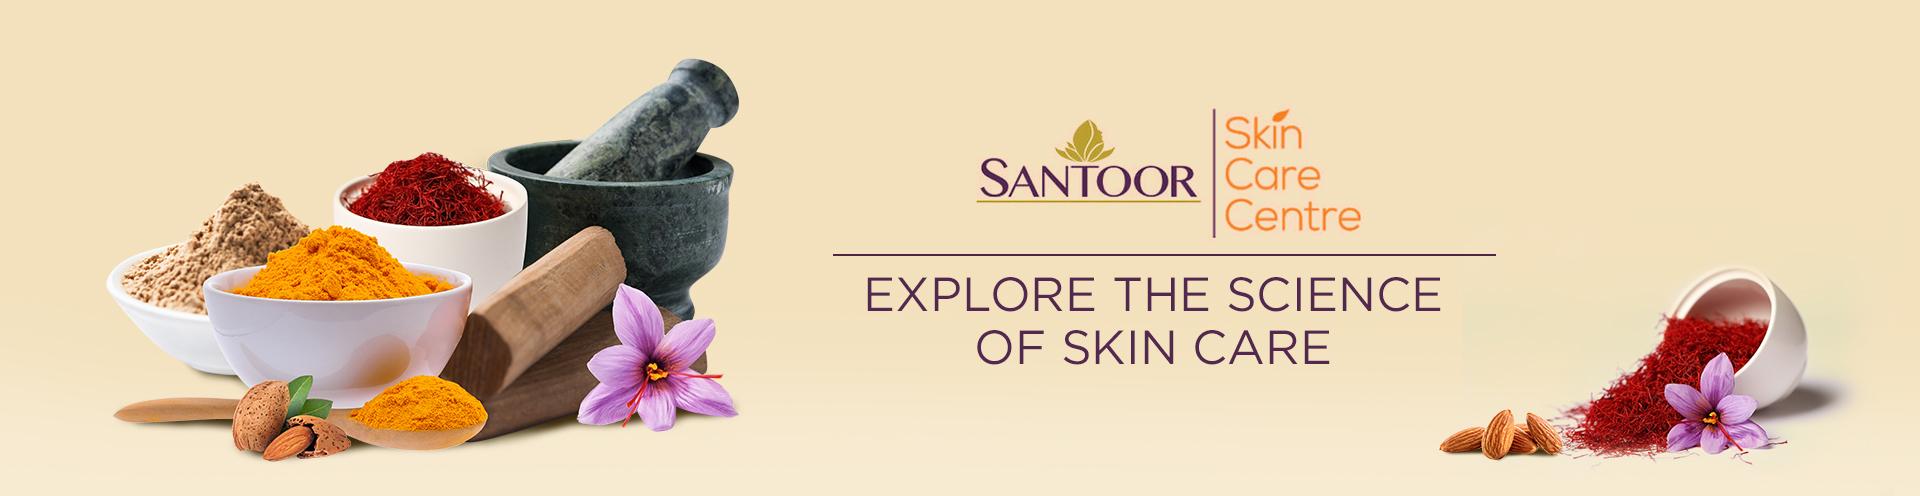 Santoor Skincare Centre